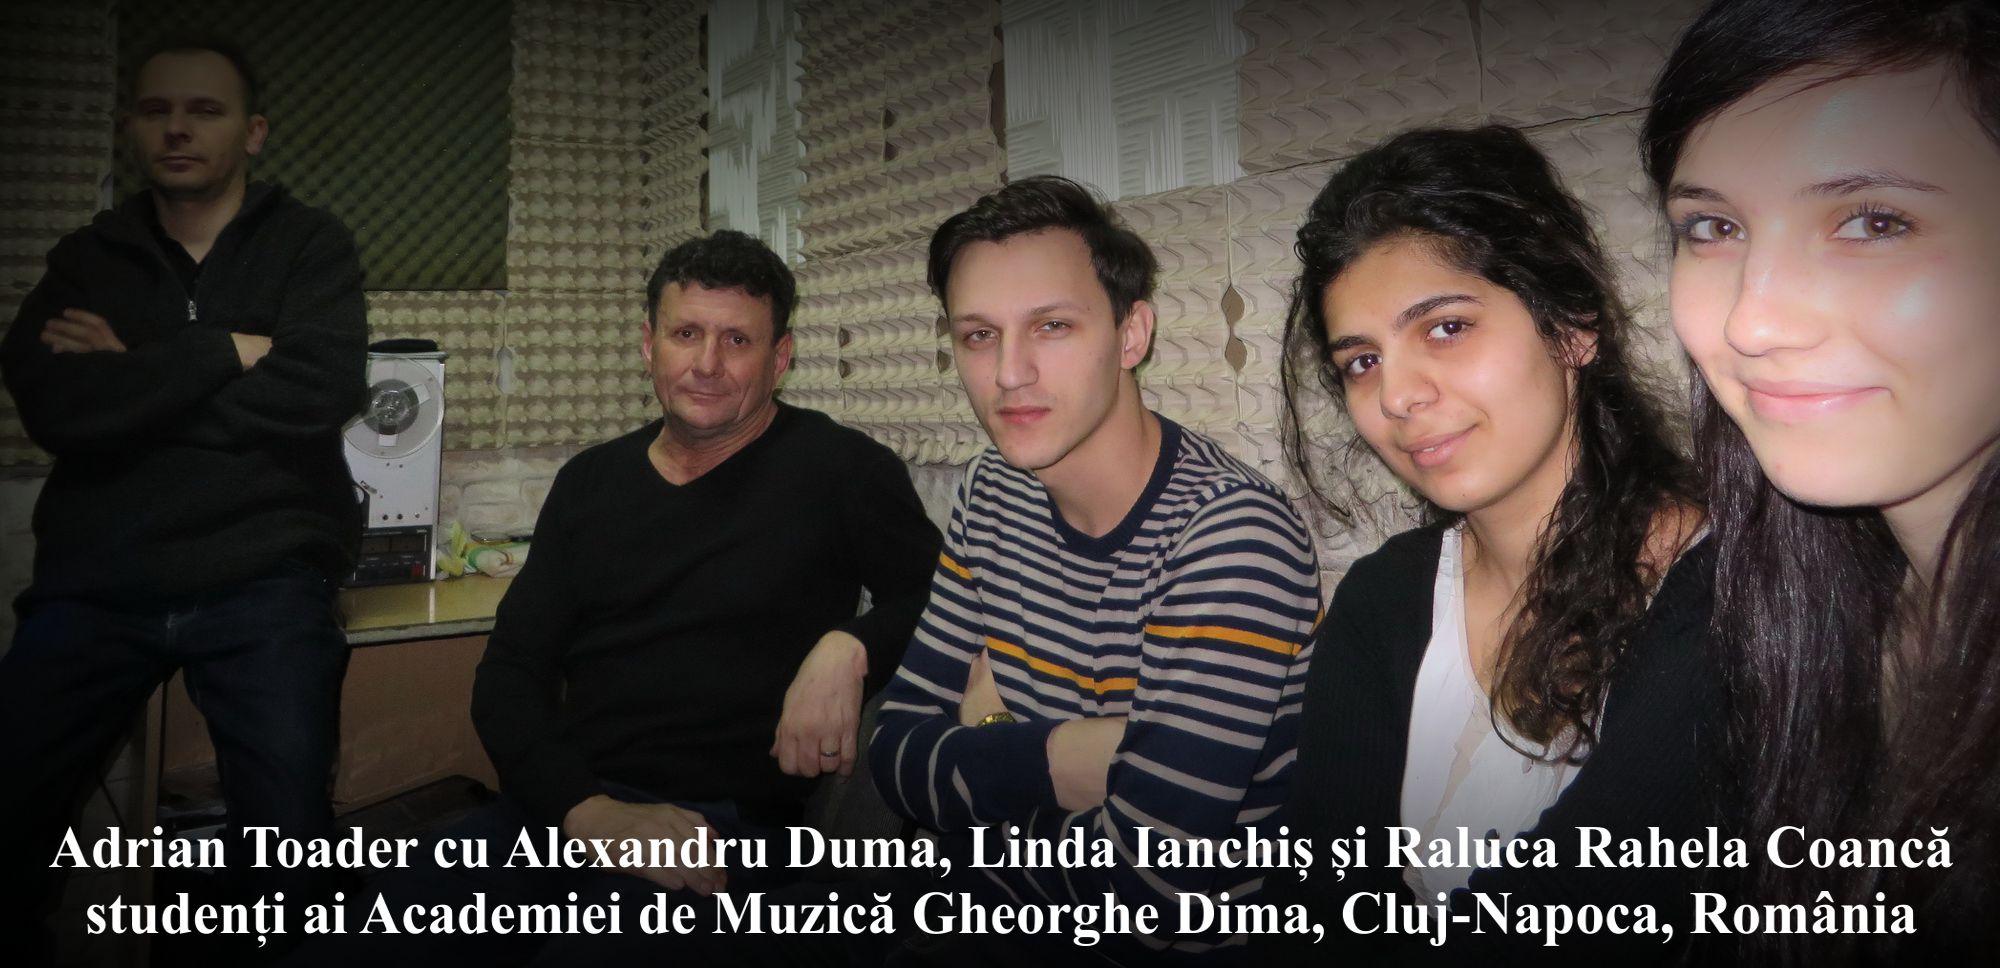 Istavan Szabo cu Adrian Toader si studentii in studioul Anton Pann Road Cluj Napoca 31 ianuarie